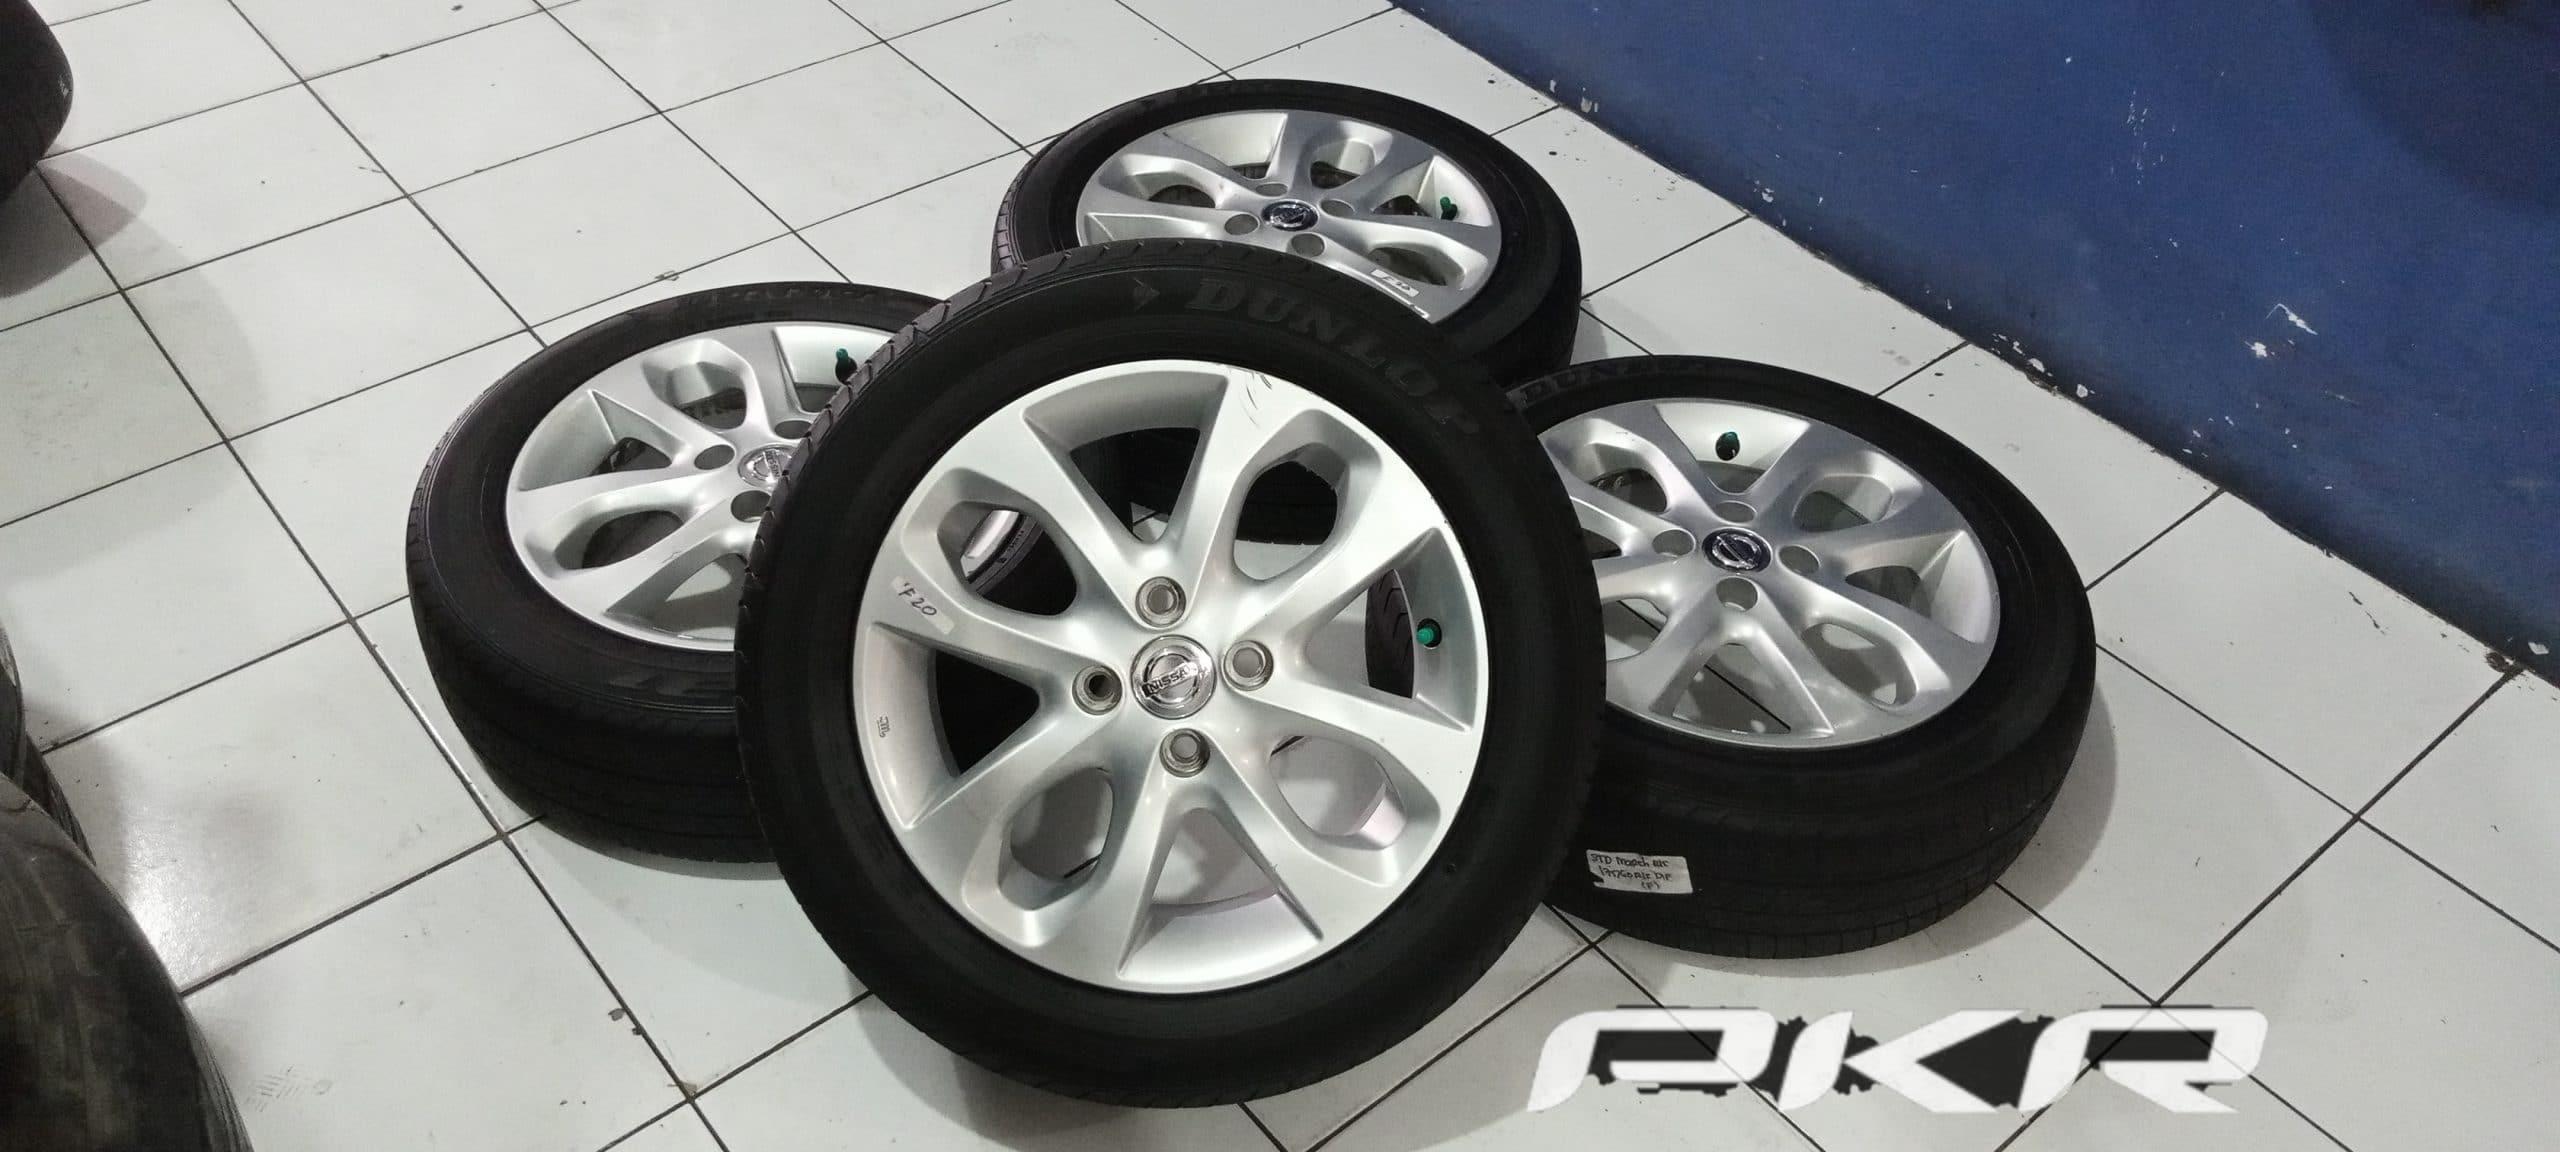 Velg Mobil OEM Nissan Match new R15 pcd 4×100 ban 175 60